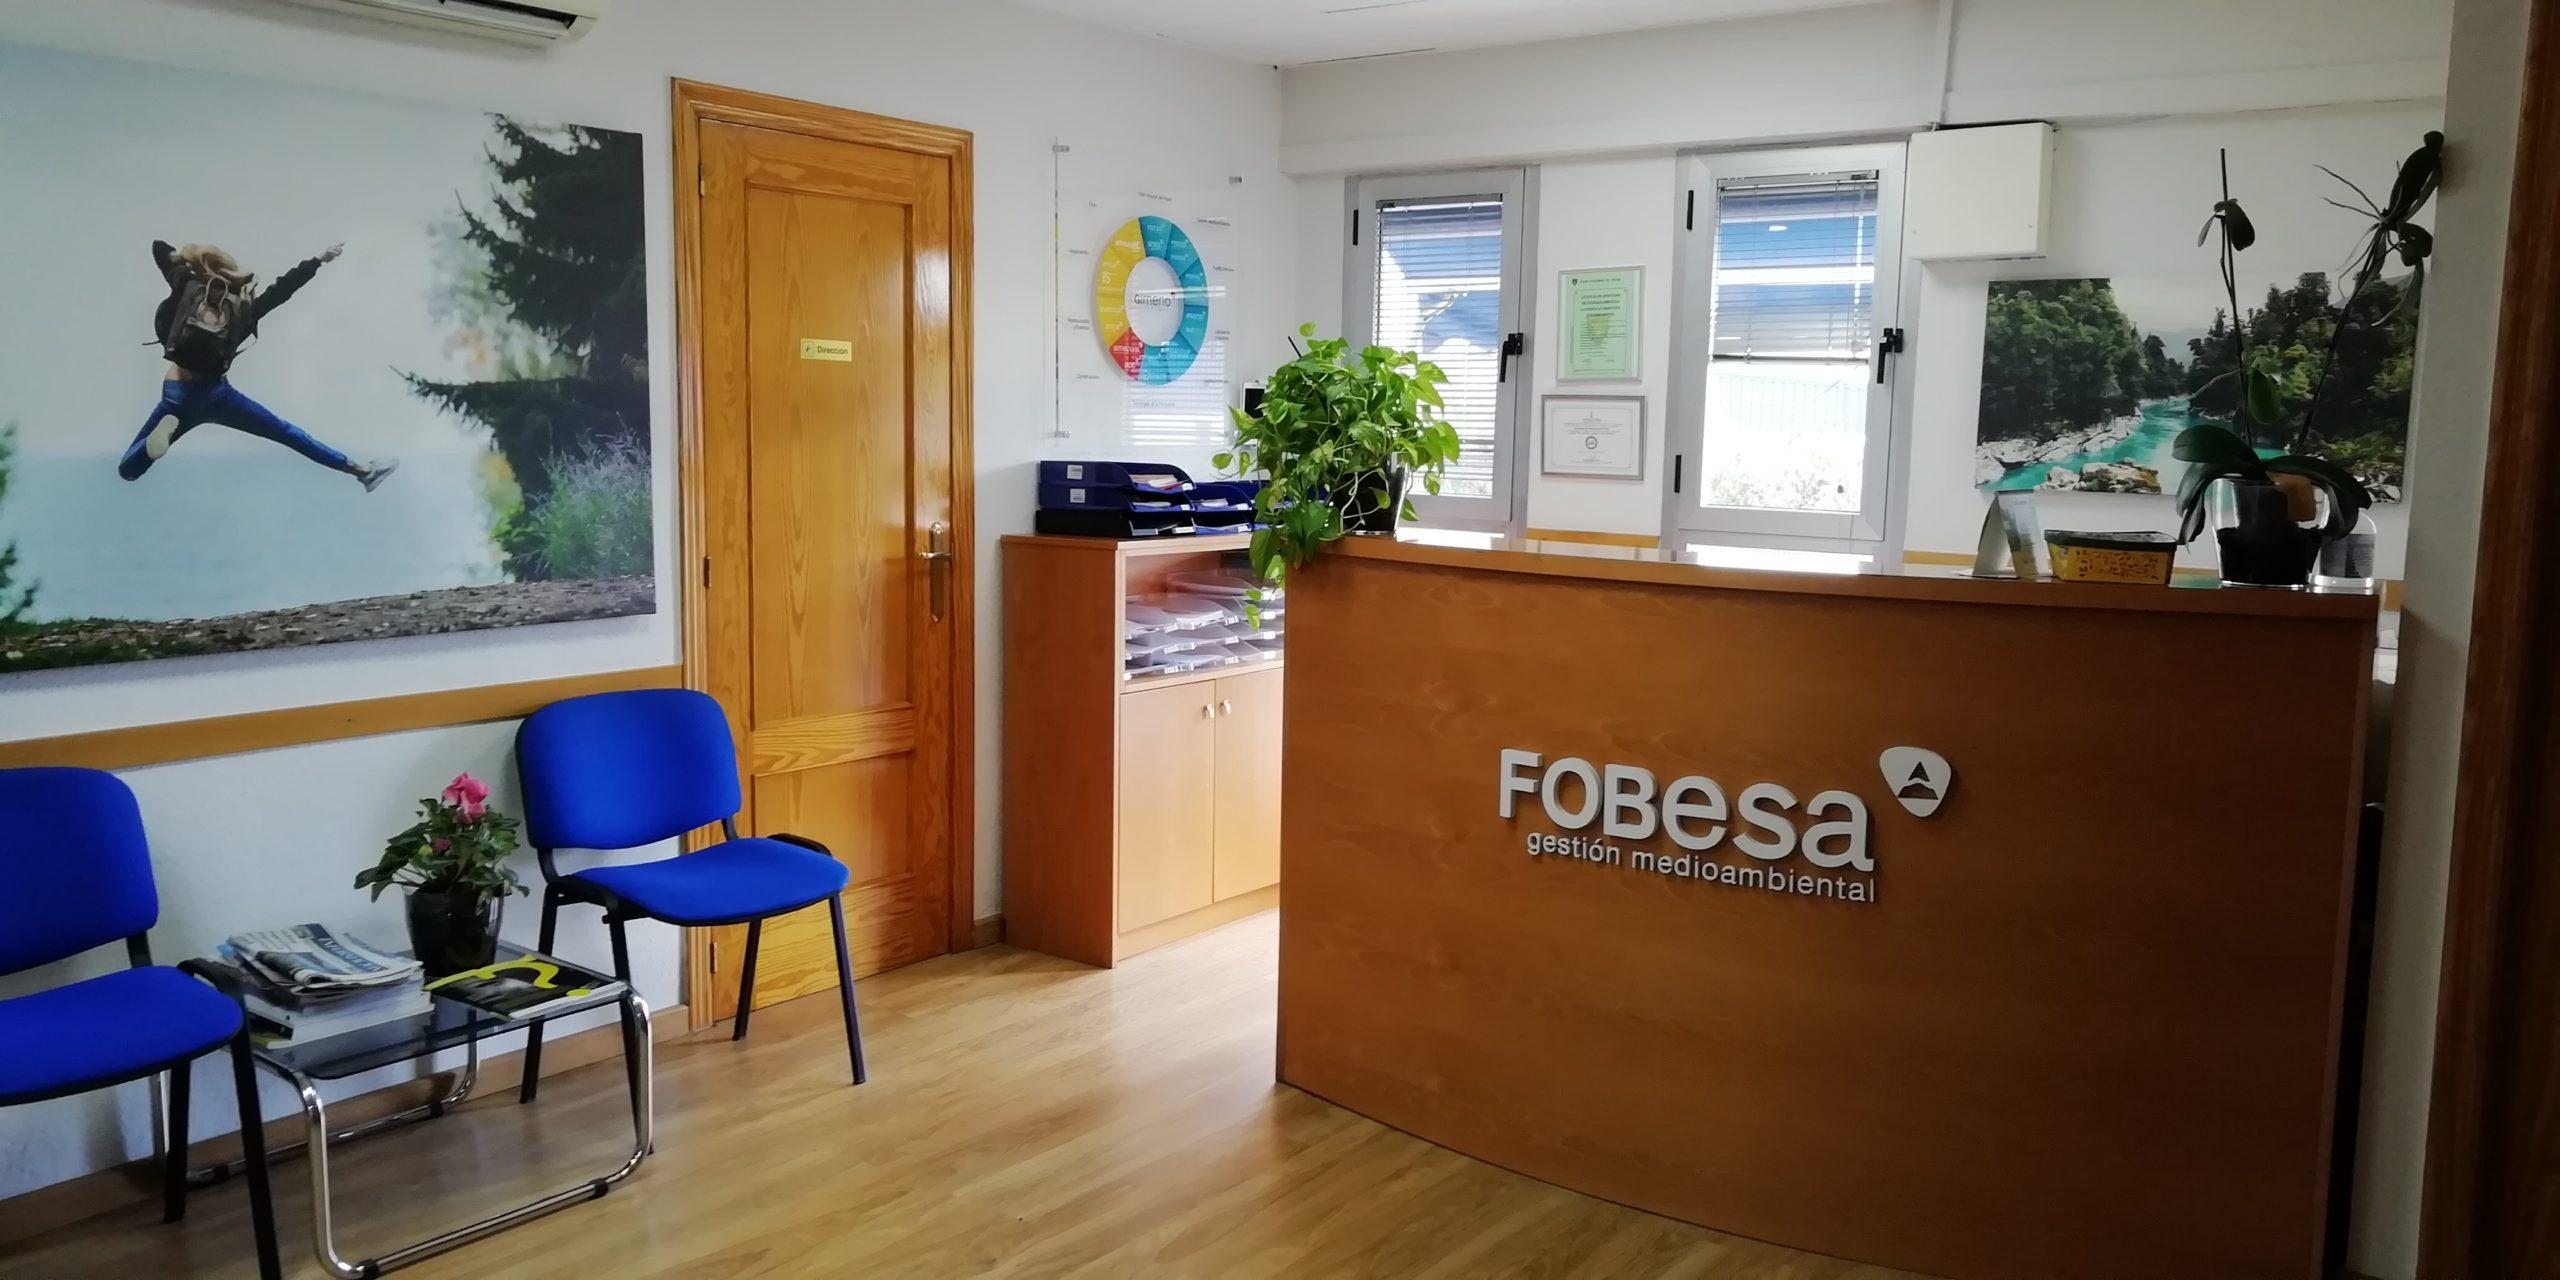 Fobesa2